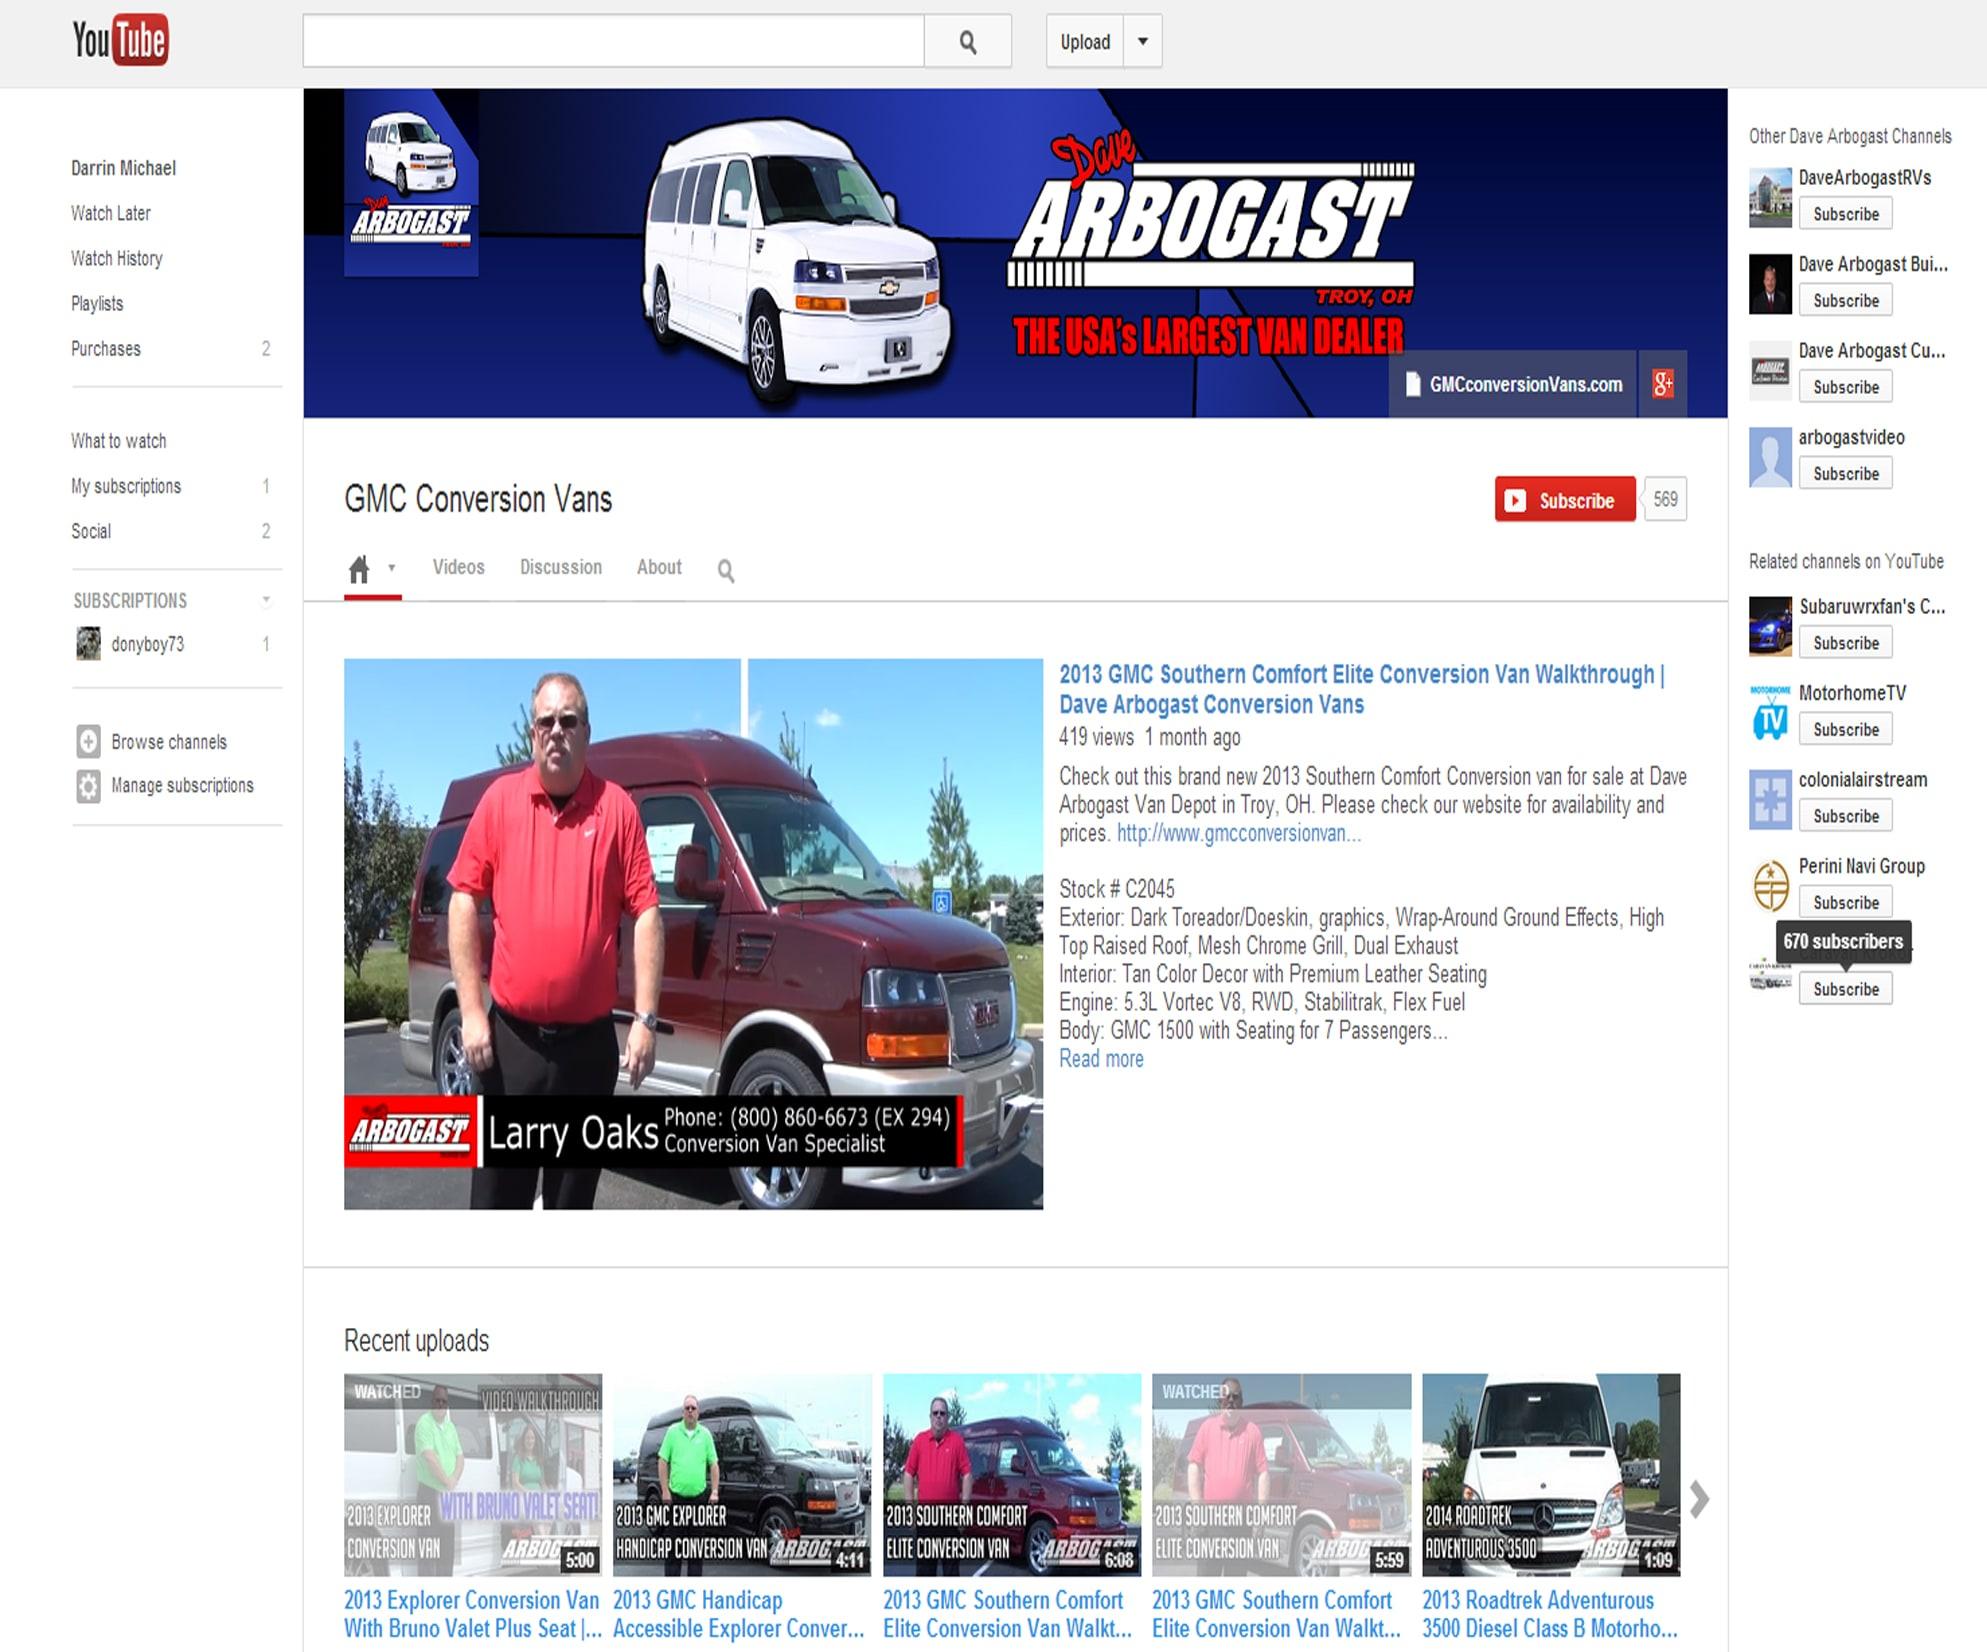 Dave Arbogast Conversion Vans